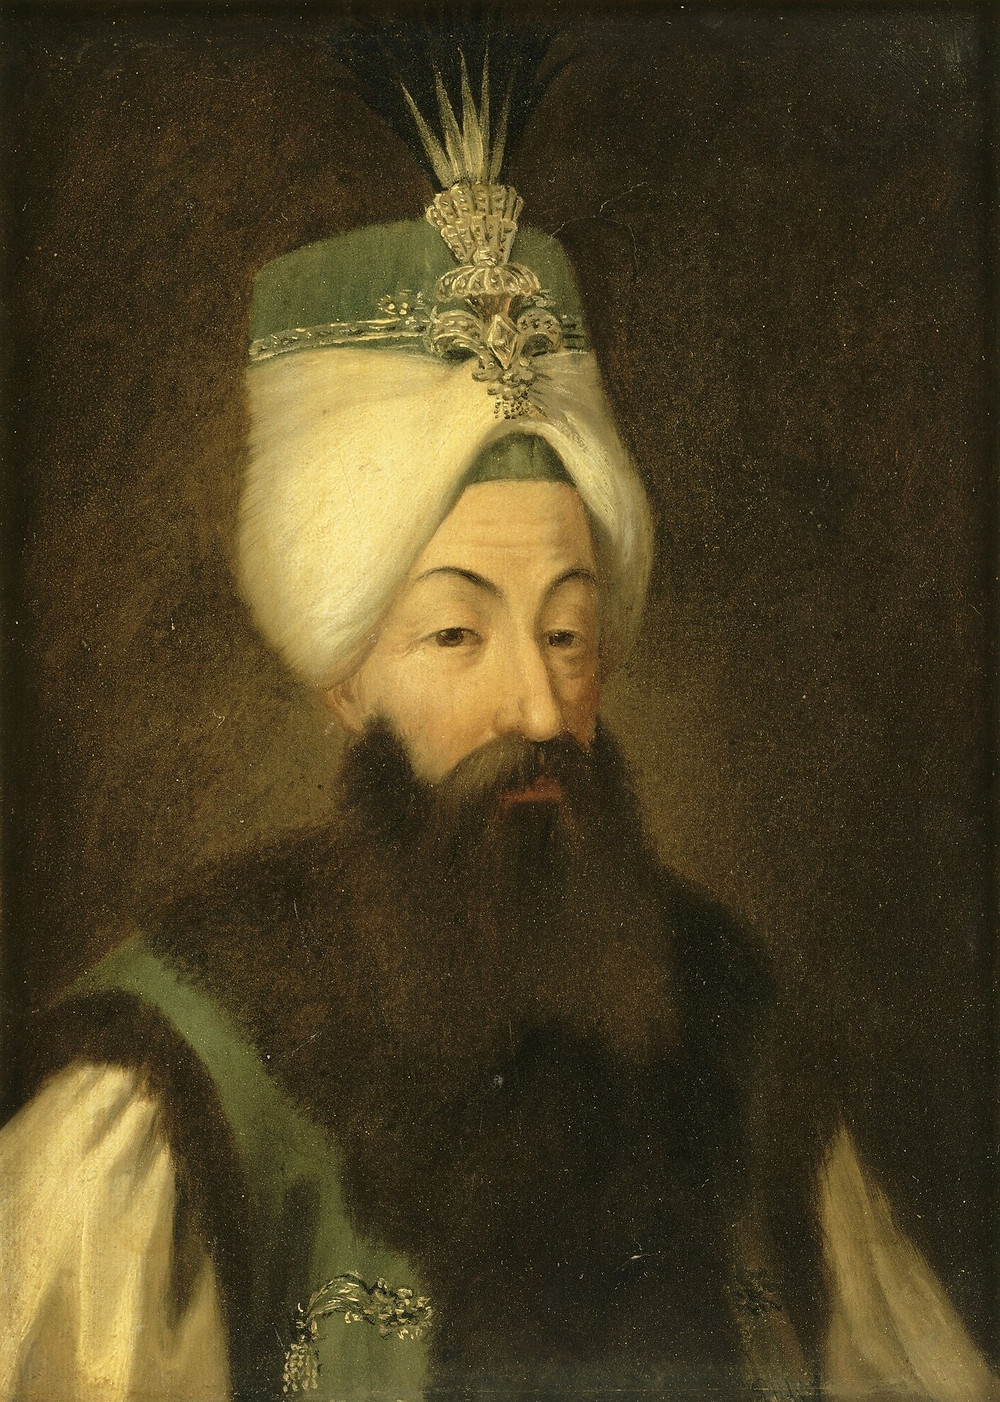 Sultan Abdul Hamid I